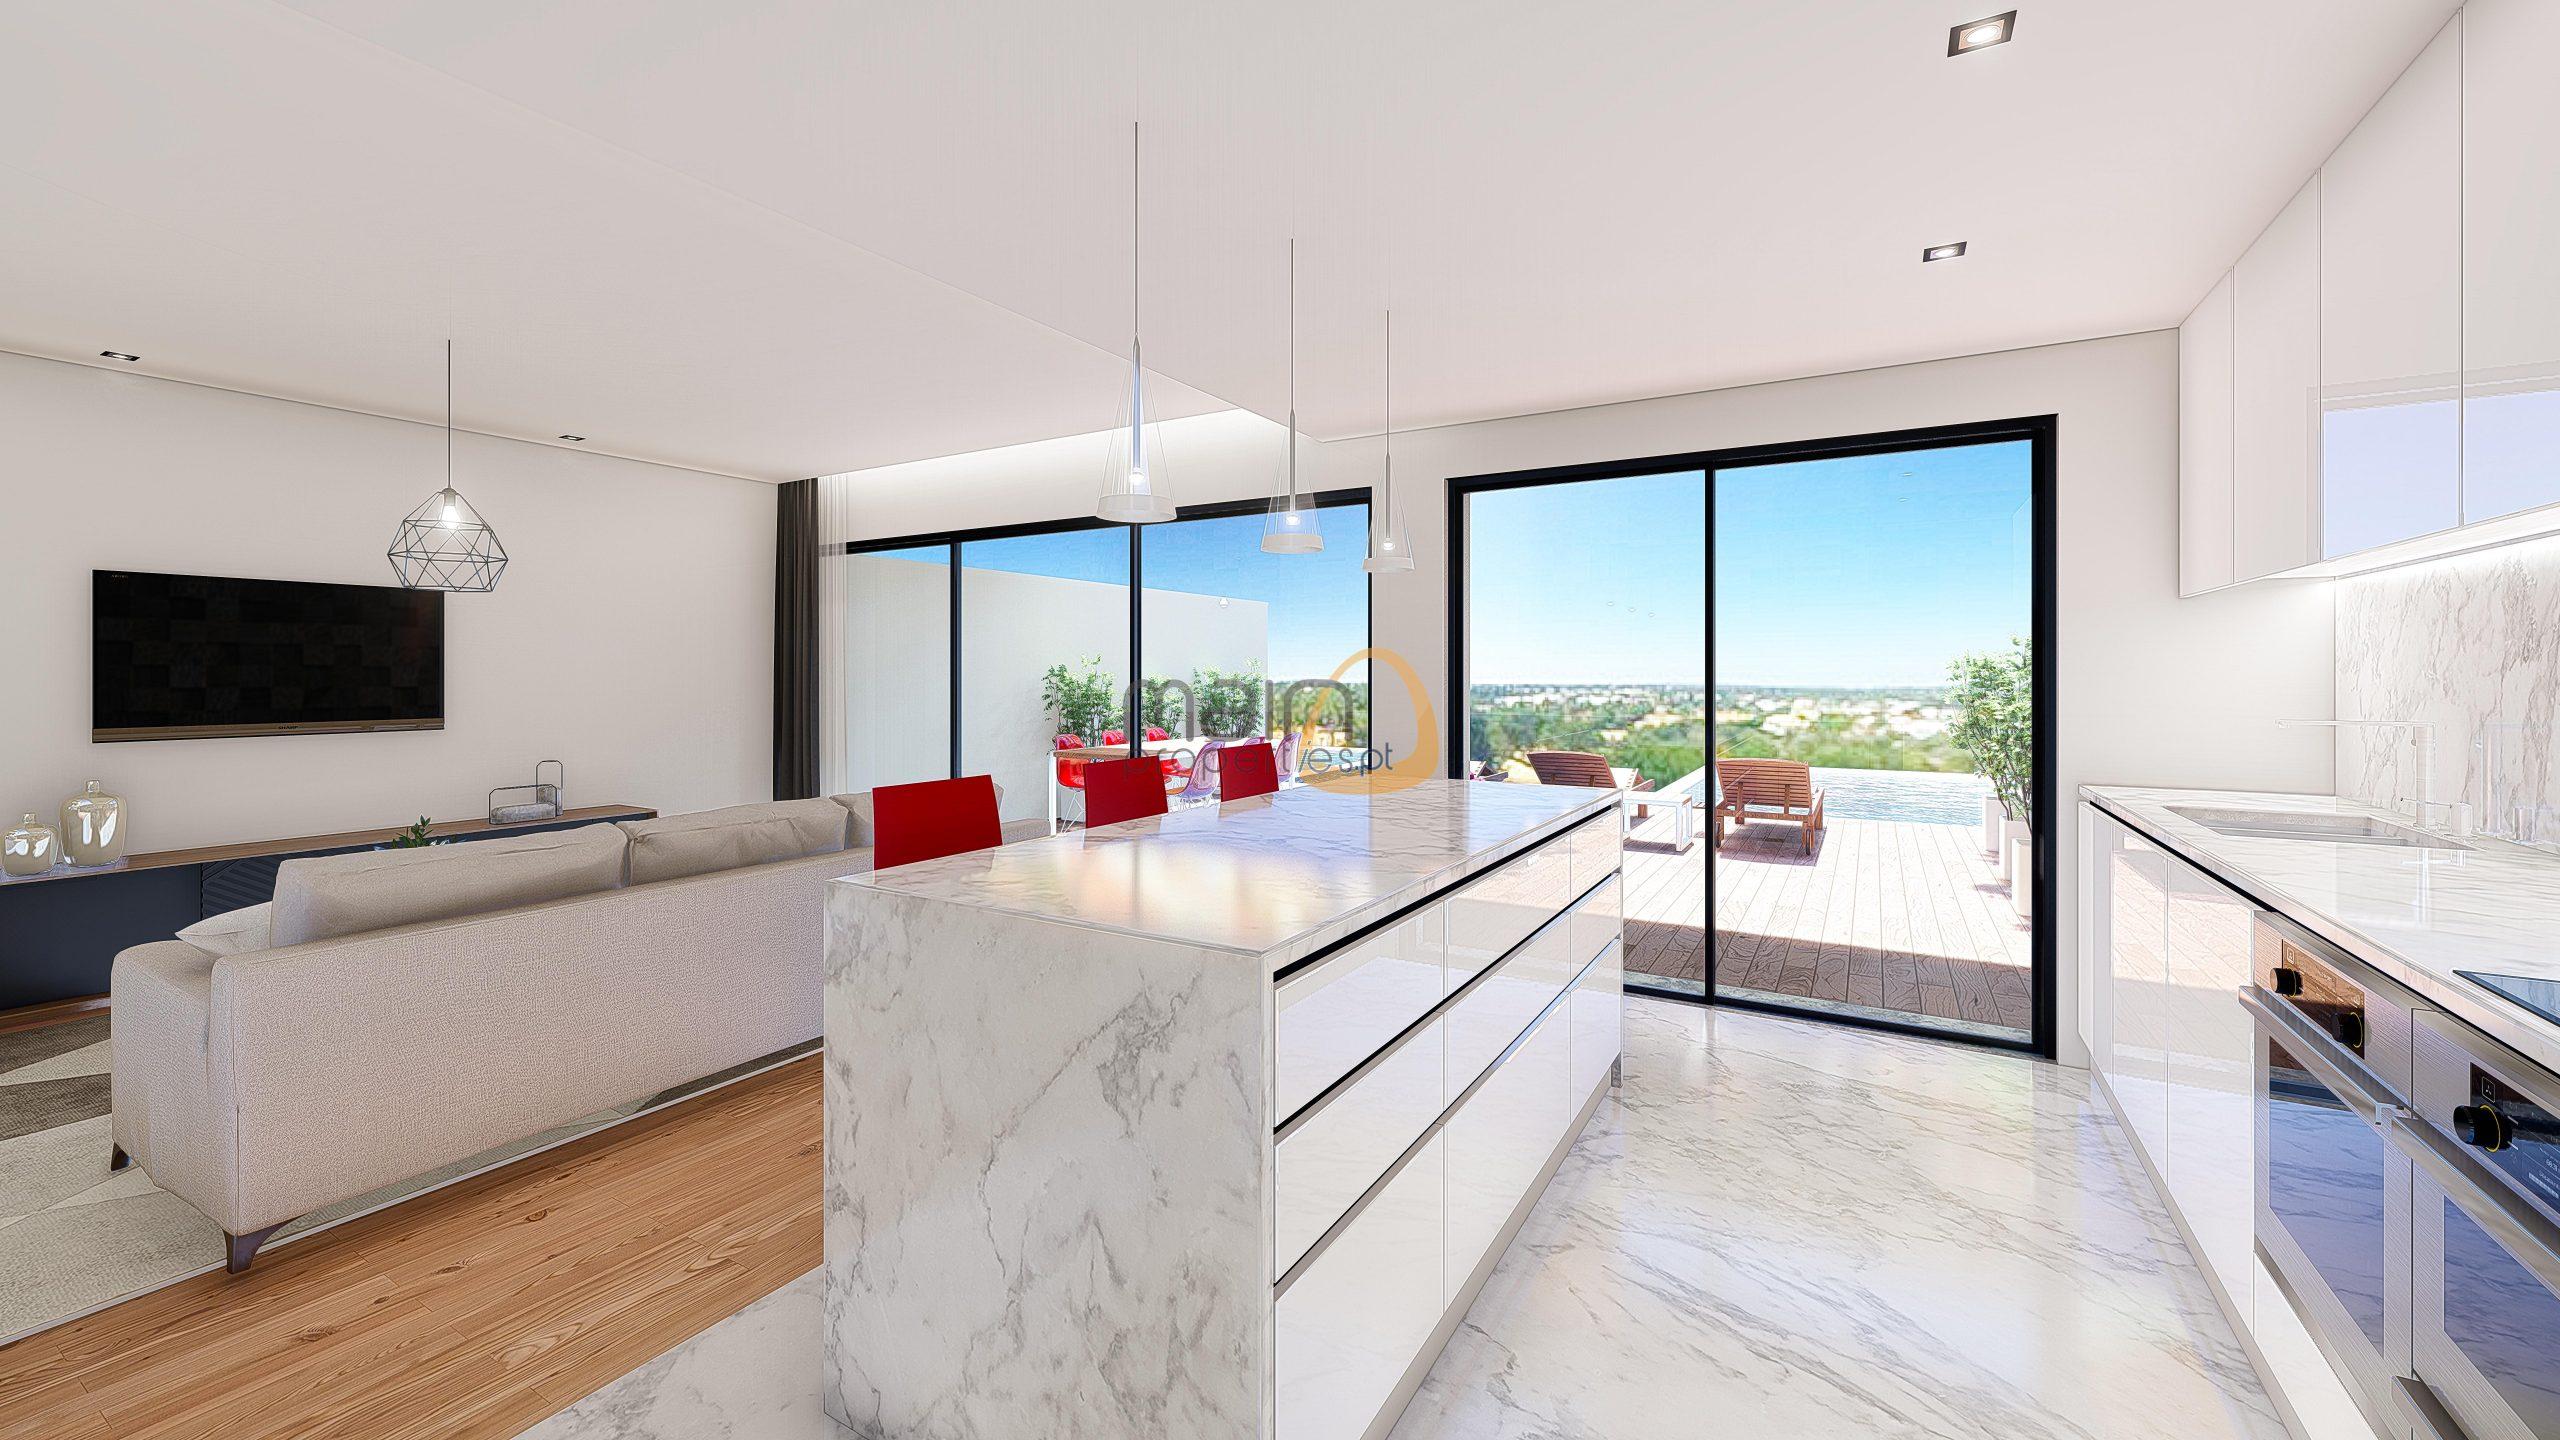 land-for-development-of-eleven-villas-with-sea-views-in-almancil-algarve-portugal-property-real-estate-13